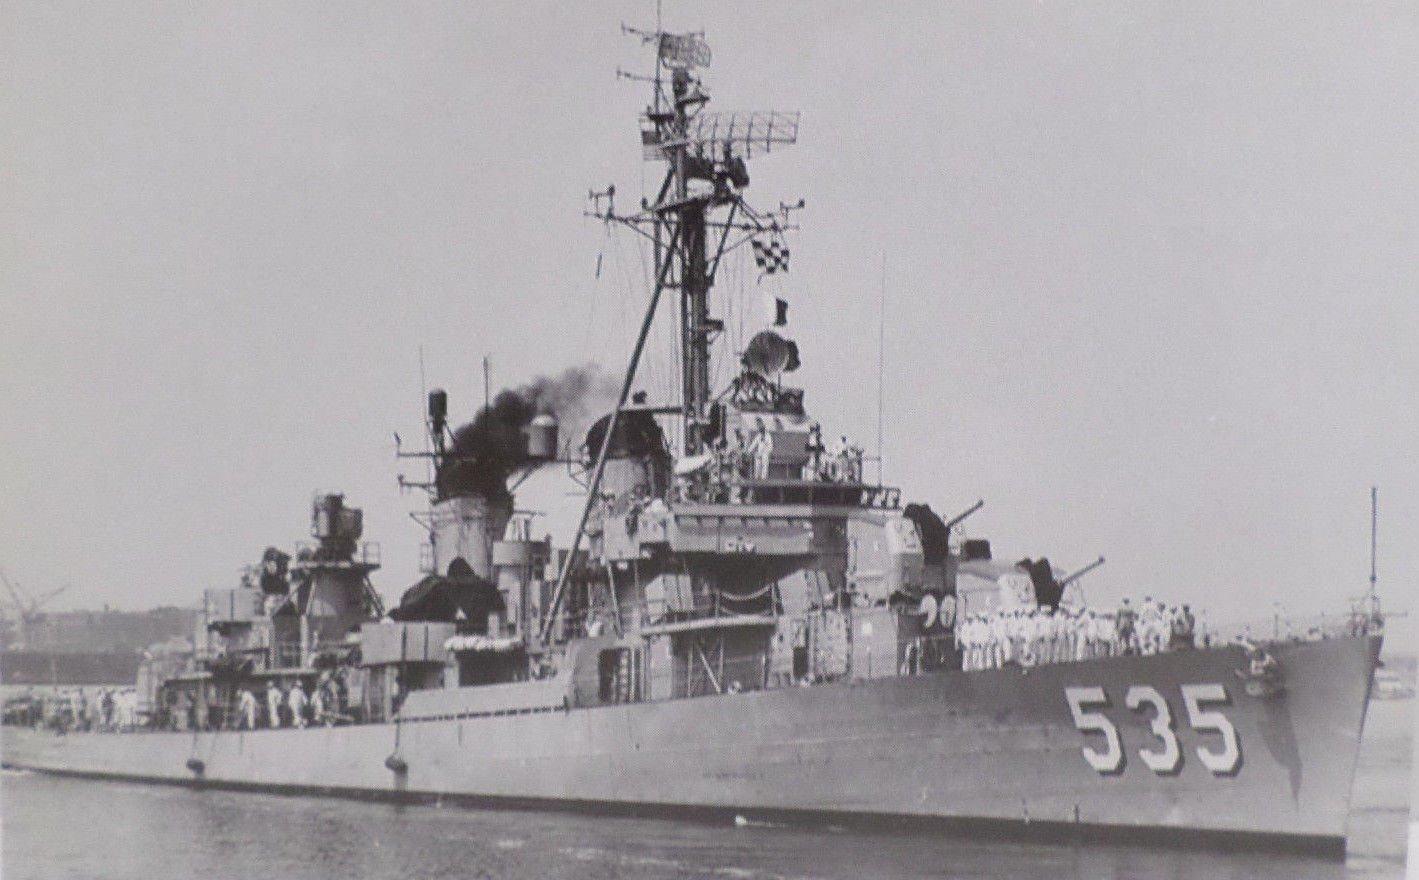 U.S.S. MILLER DD-535 Battleship Real Photo Postcard Official U.S. Navy NEW